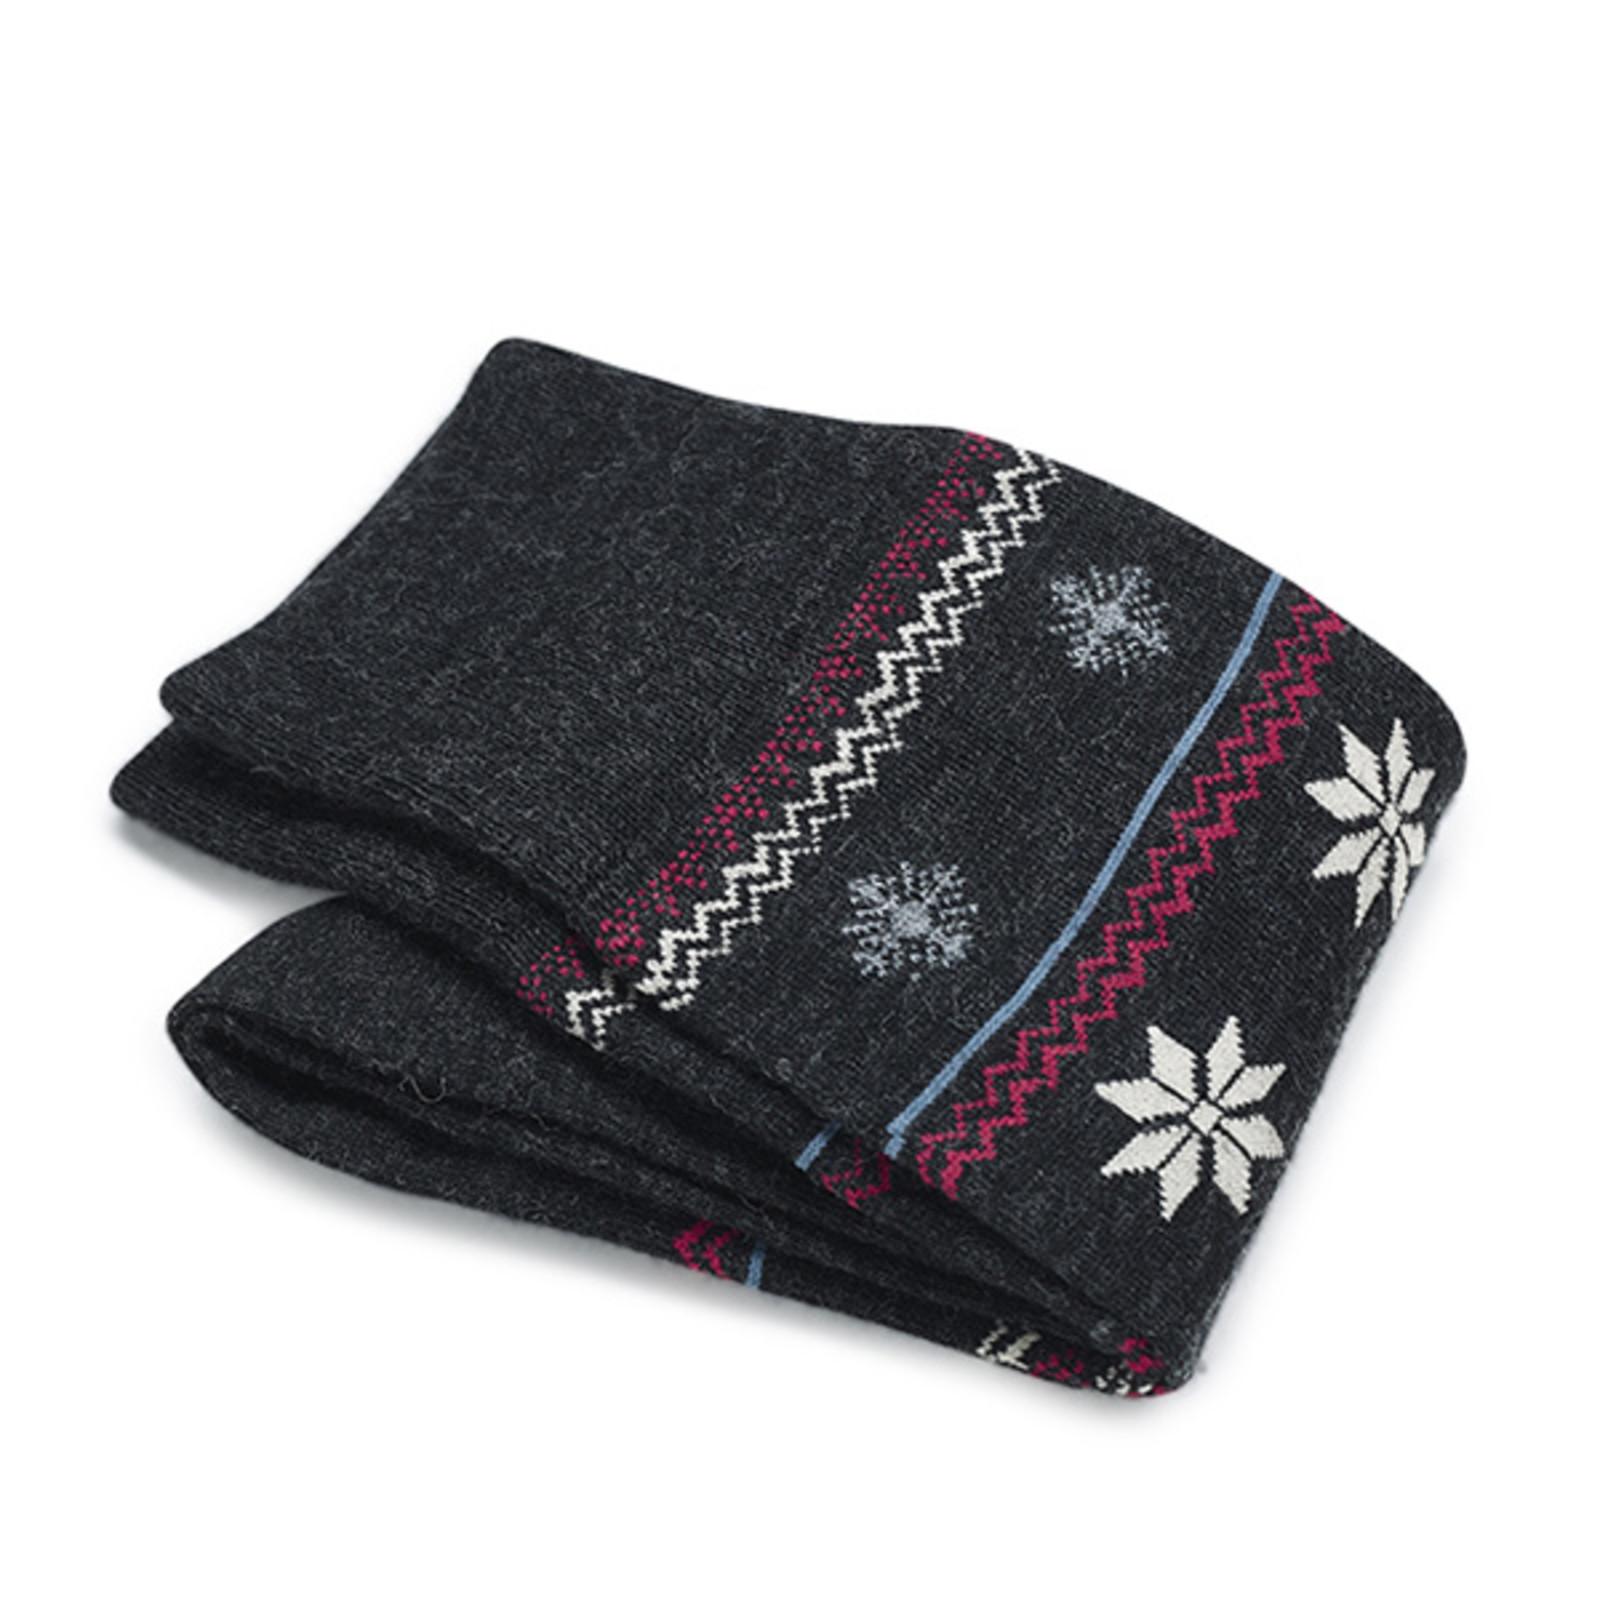 Carlo Lanza Winter sokken grijs | Carlo Lanza